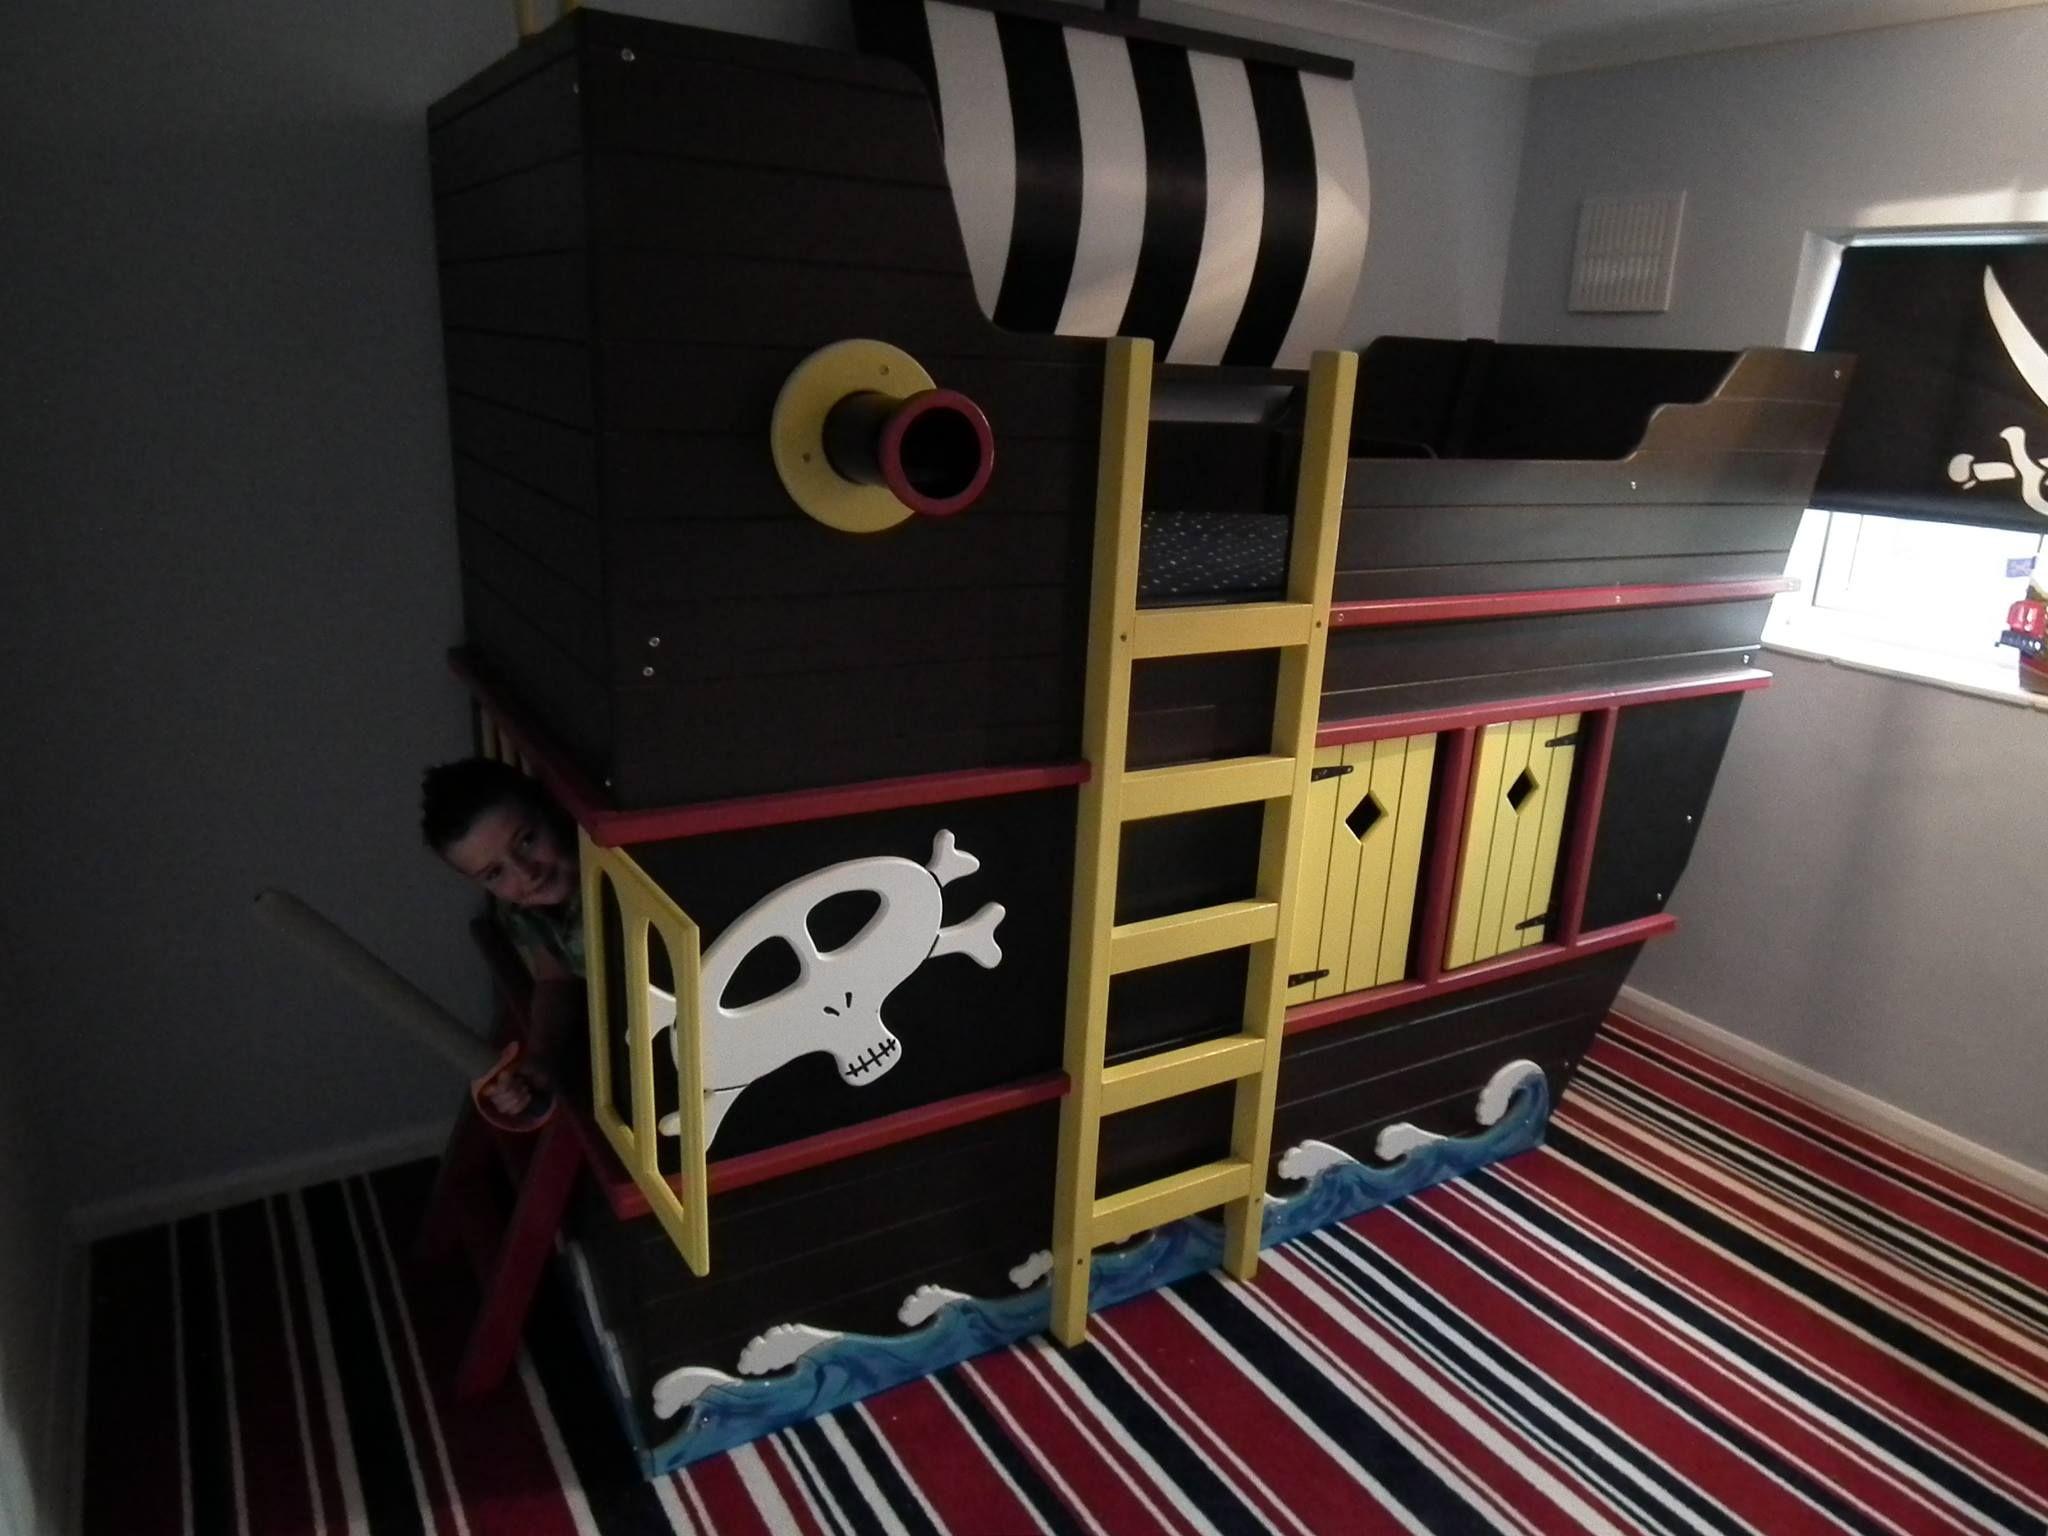 Pirate Ship Bed By Dreamcraft Furniture Www Facebook Com